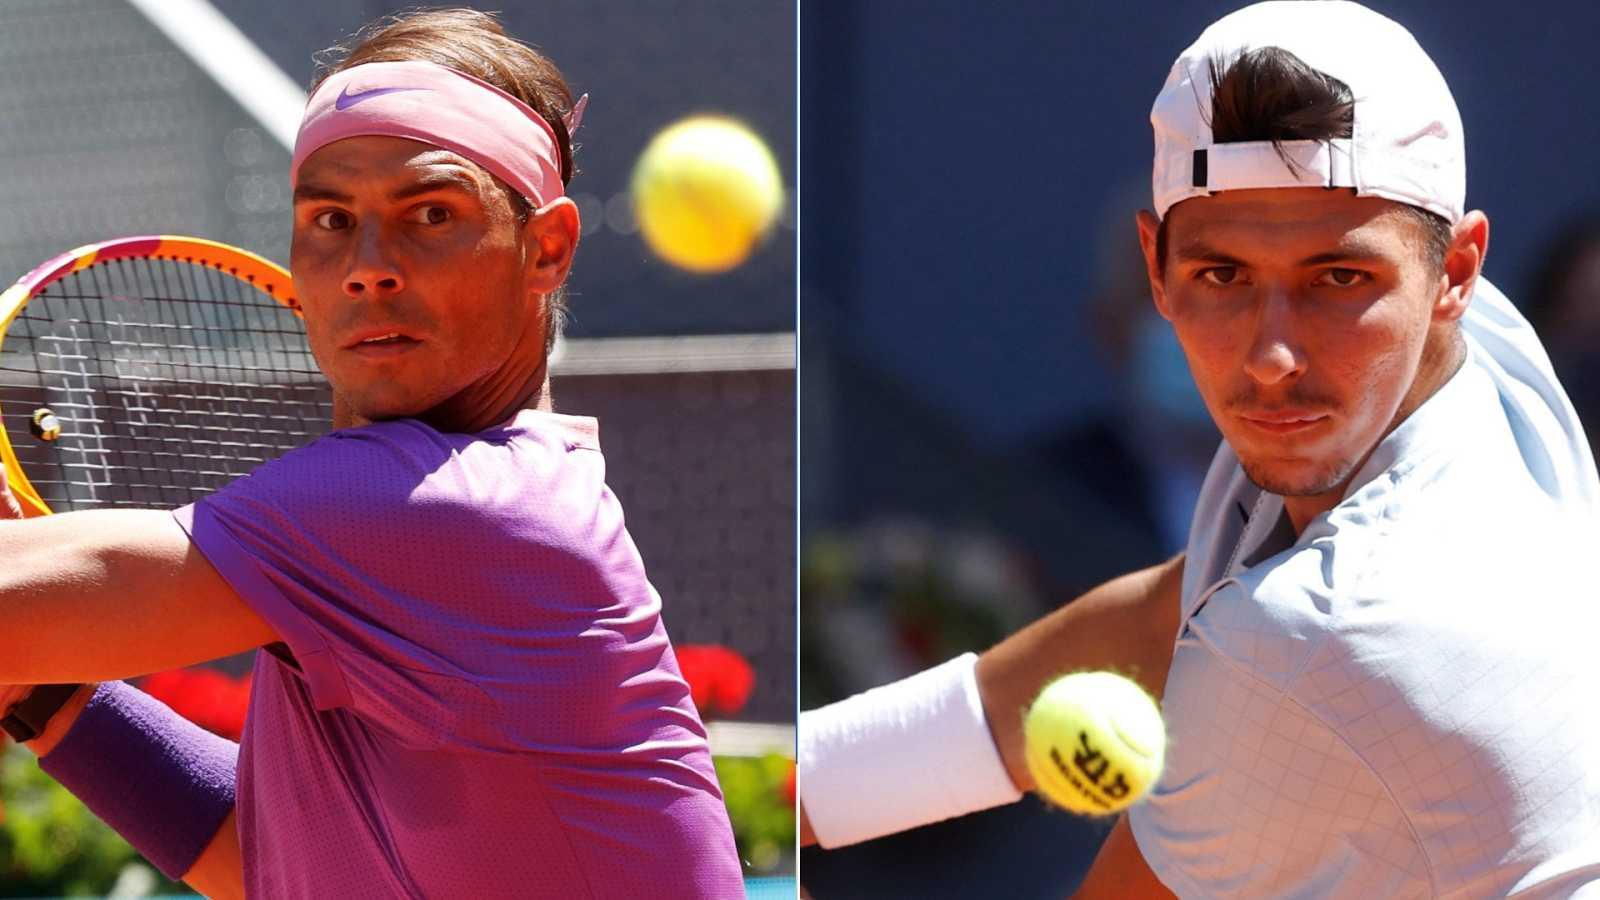 Tenis - ATP Mutua Madrid Open: Rafael Nadal - Alexei Popyrin - ver ahora